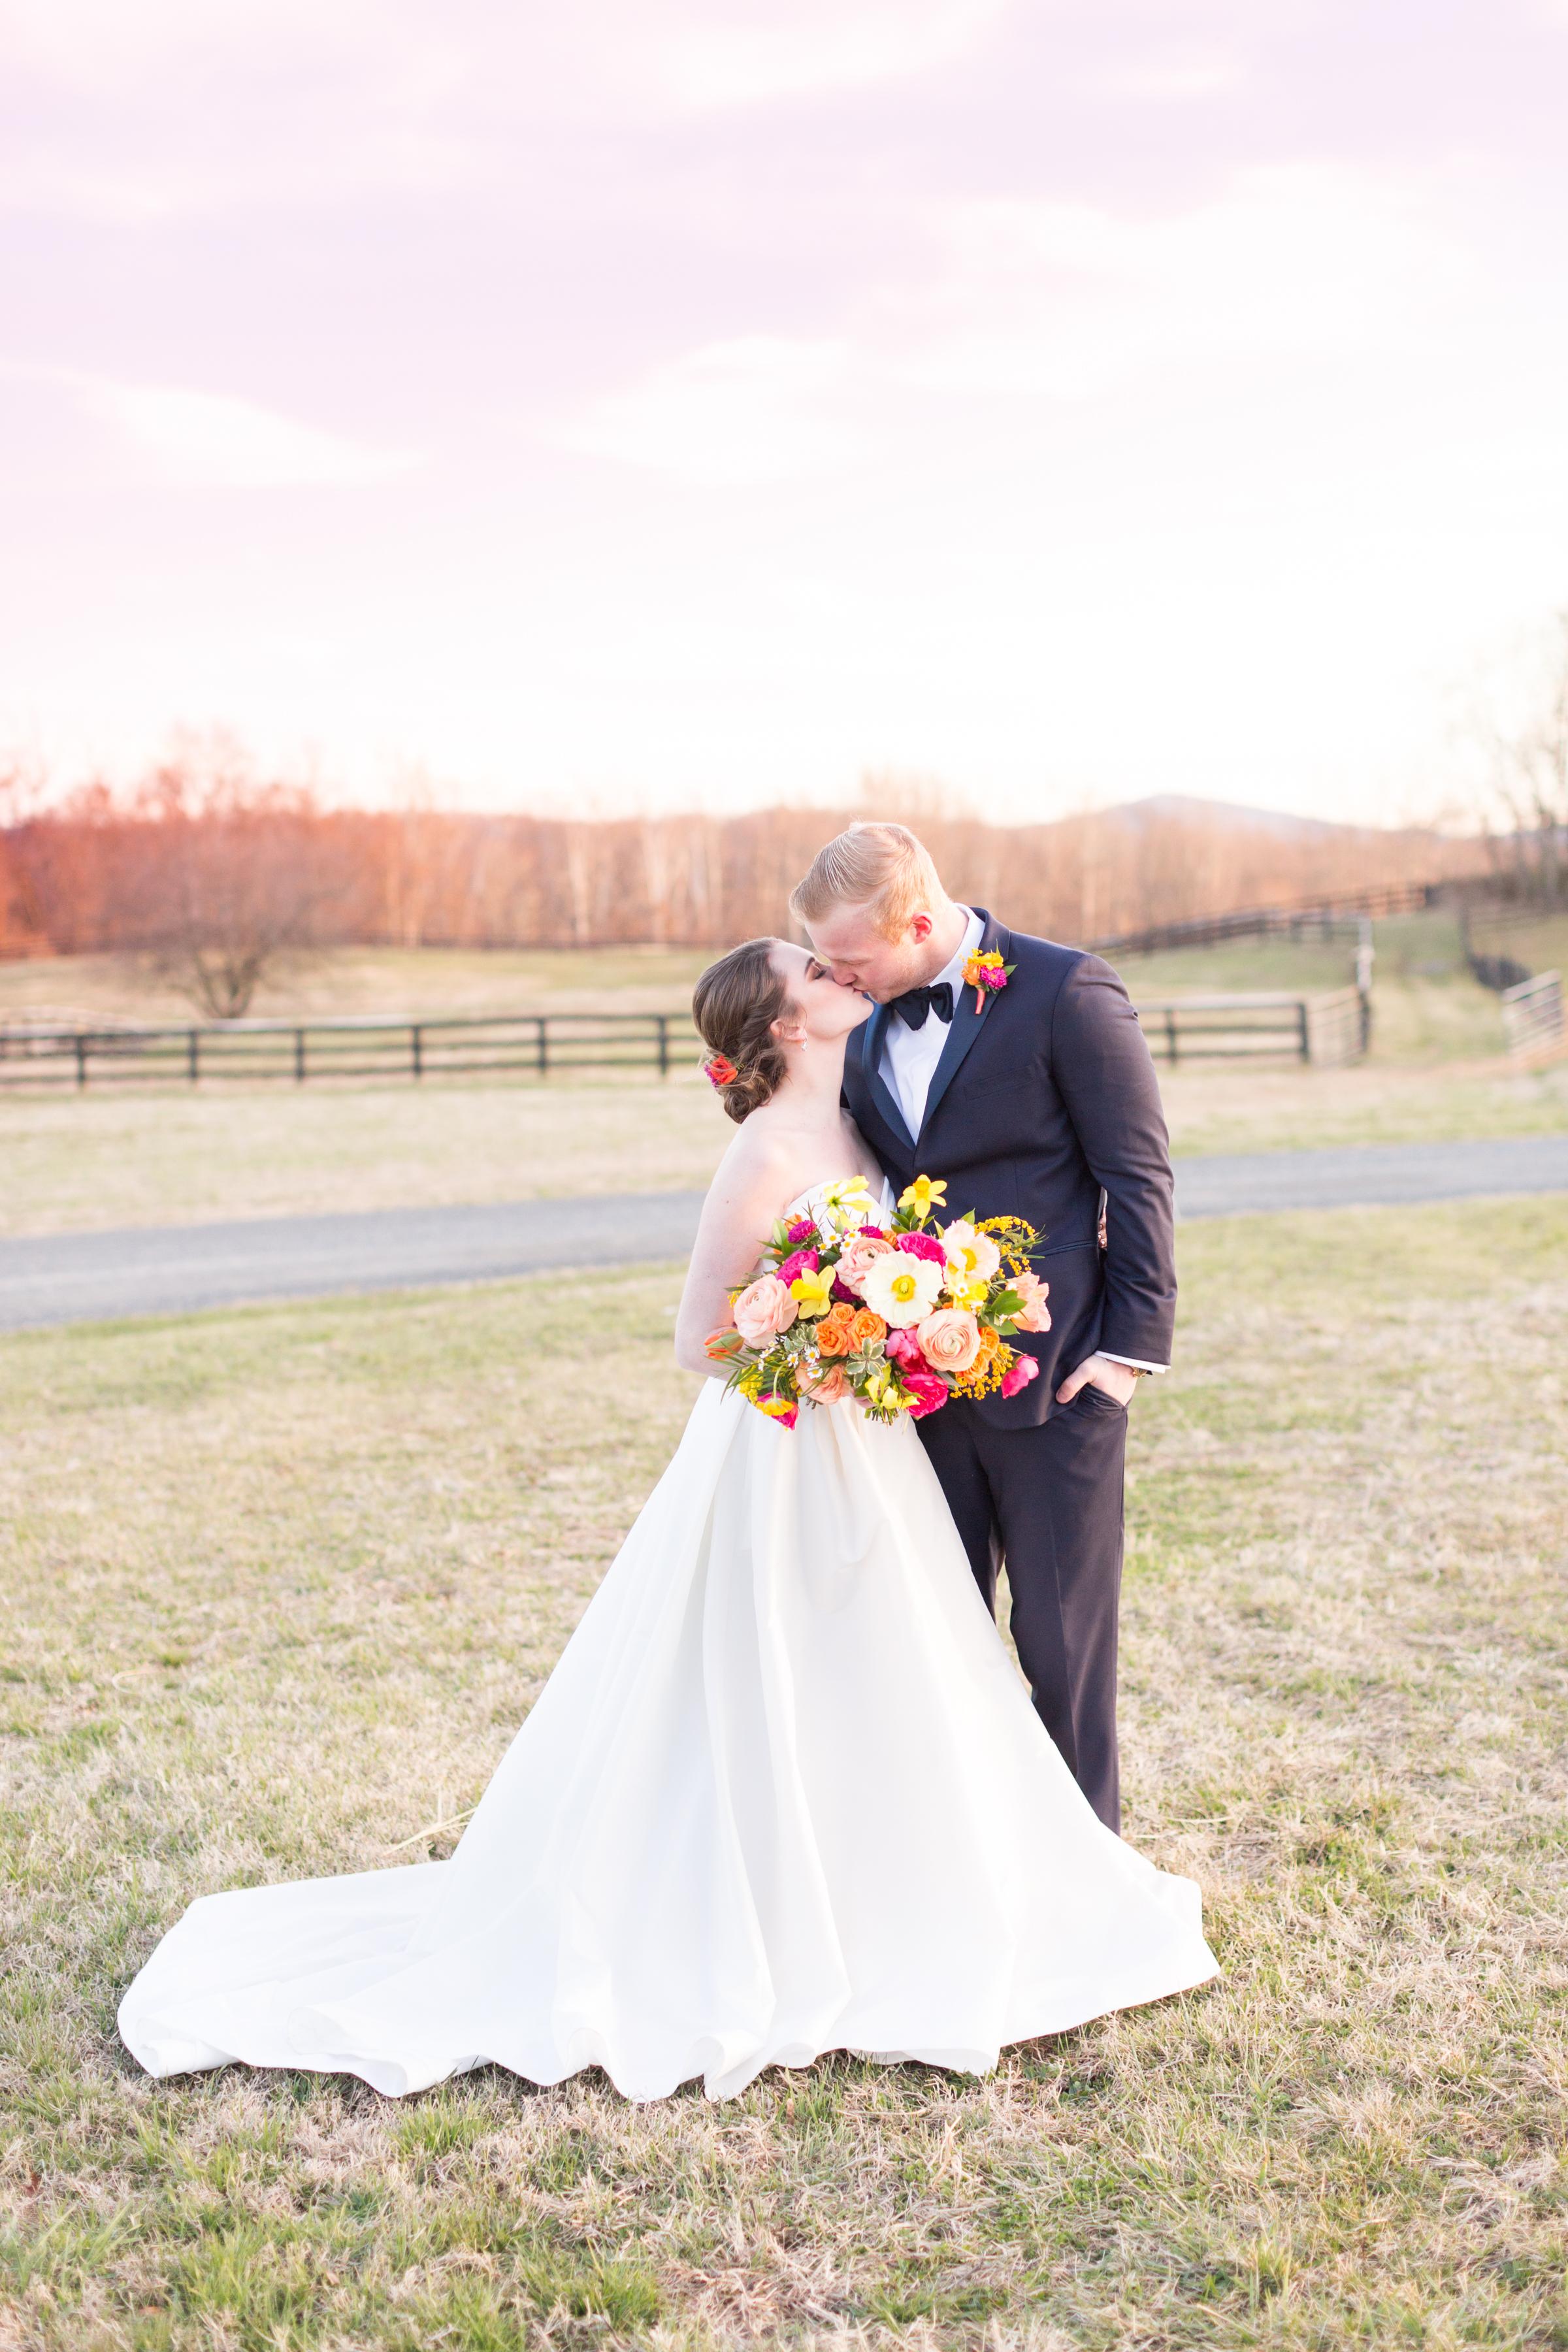 Equestrian Wedding at Middleburg Barn  Brett Denfeld Photography